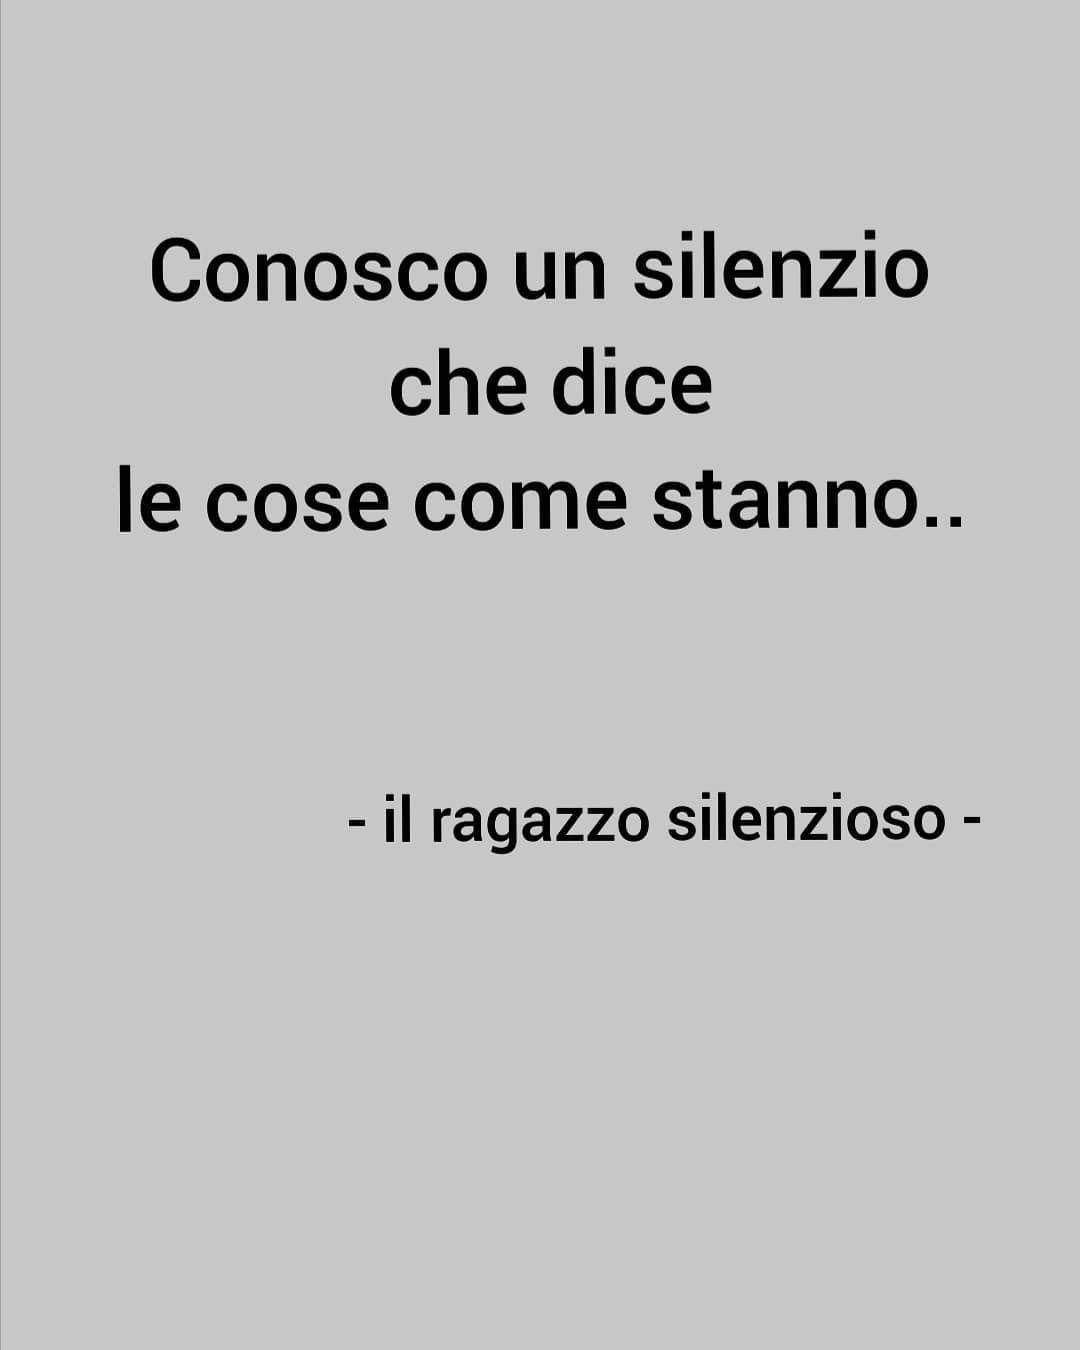 Nuovo post . . . . . . . . . . . . . . . #tumblr #frasitumblr #frasitristitumblr #frasitristi #frasi #amore #mimanchi #tiamo #tumbler #frasiromantiche #romantic #followforfollowback #follow #liketime #likeforfollow #ilragazzosilenzioso #frasirap #rap #seguimi #tornadame #amore #love #likeme #life